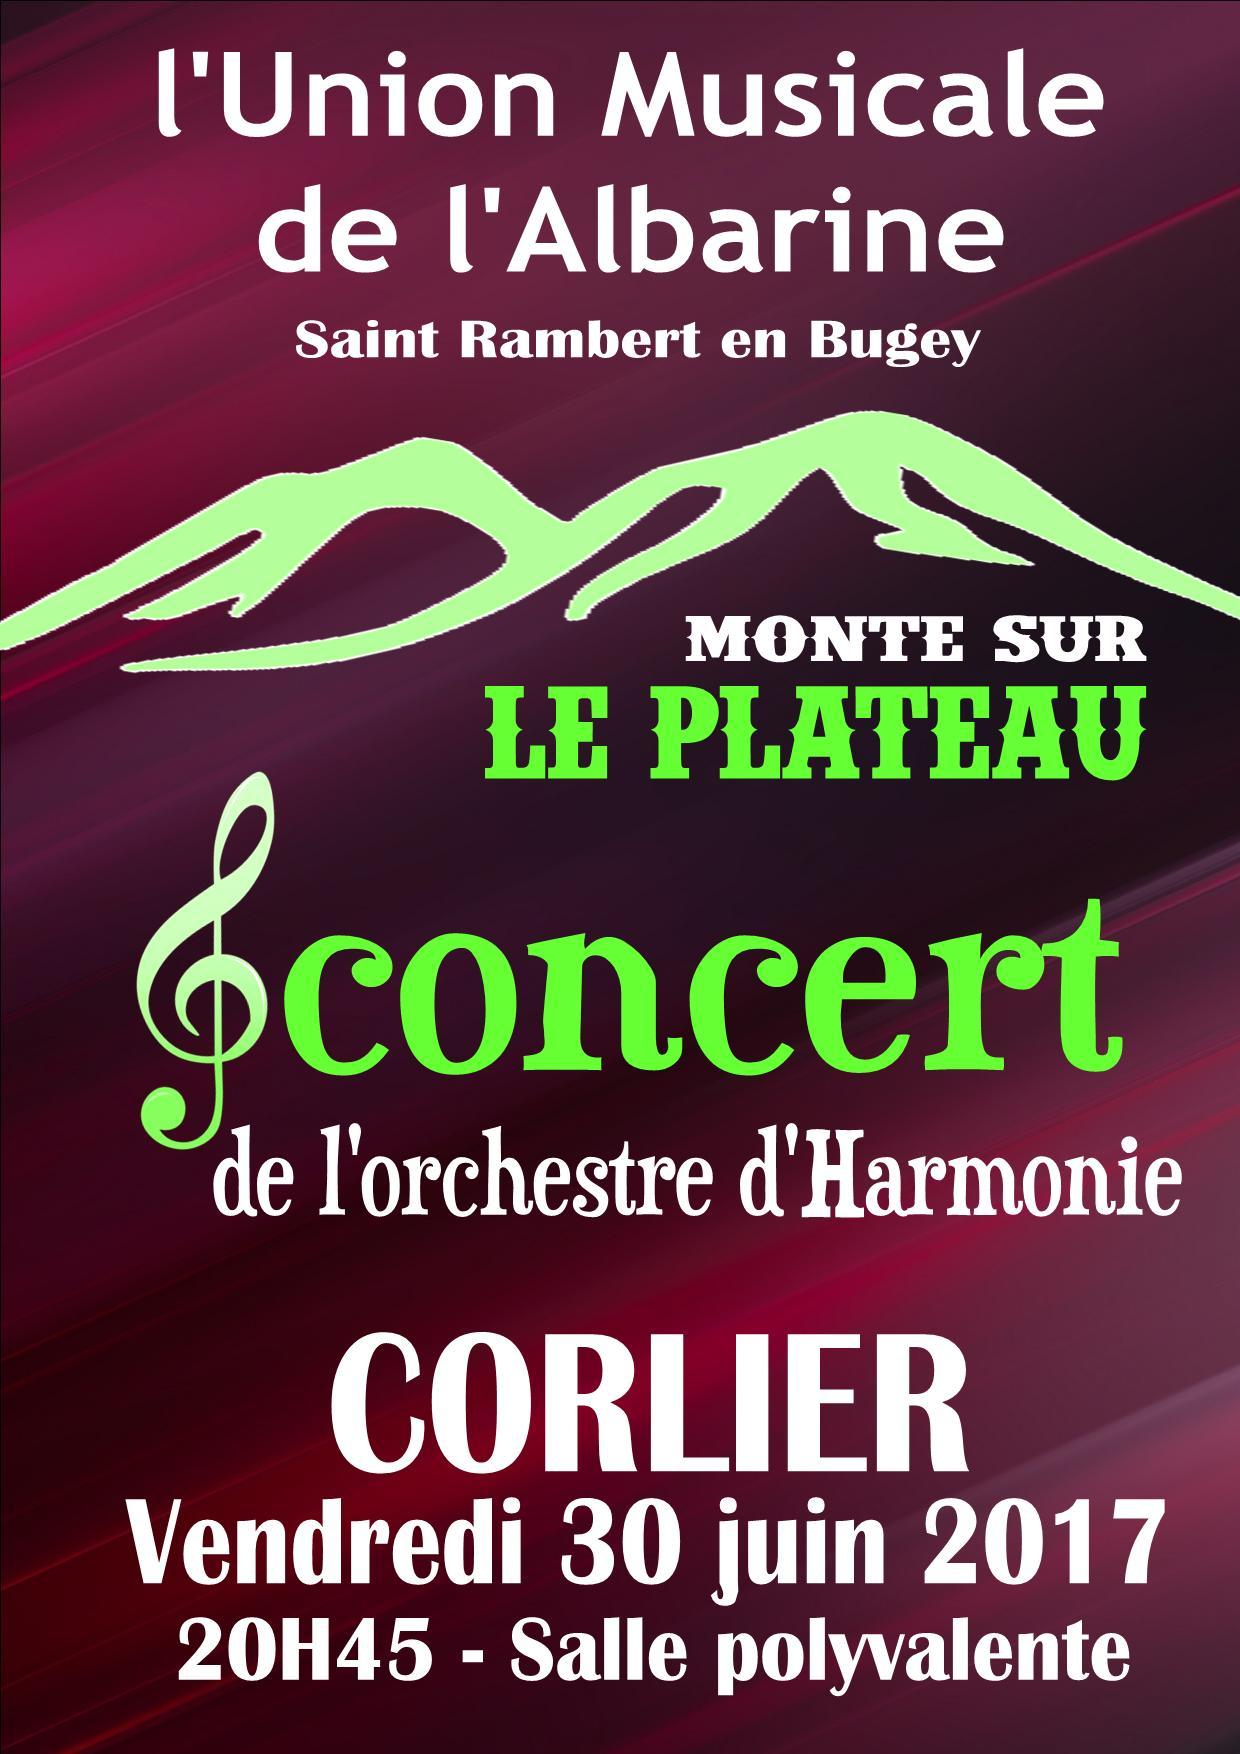 Concert Corlier Union Musicale Albarine 30 juin